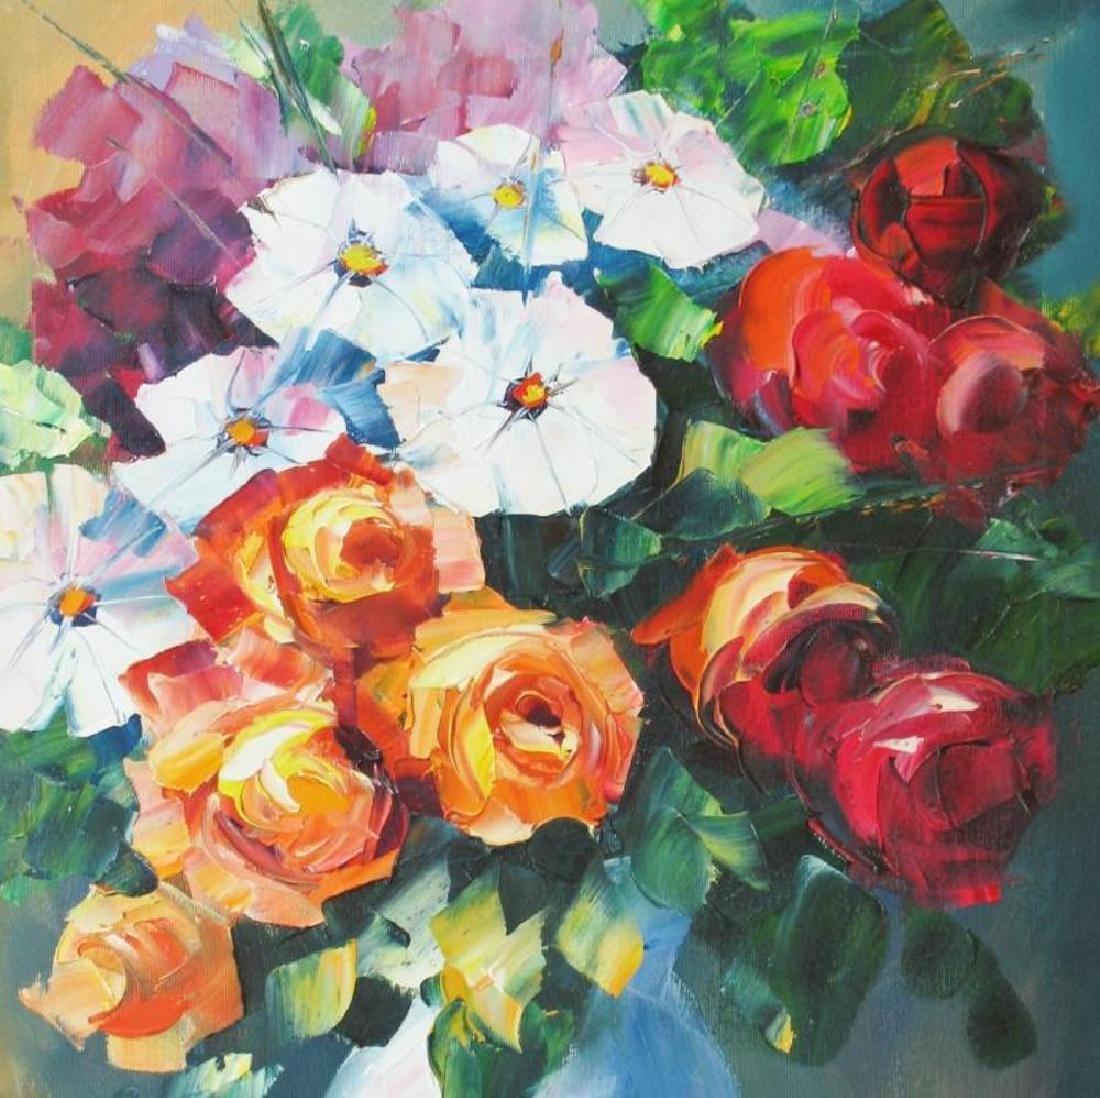 Colorful Palette Knife Textured Floral Origina Canvas - 3